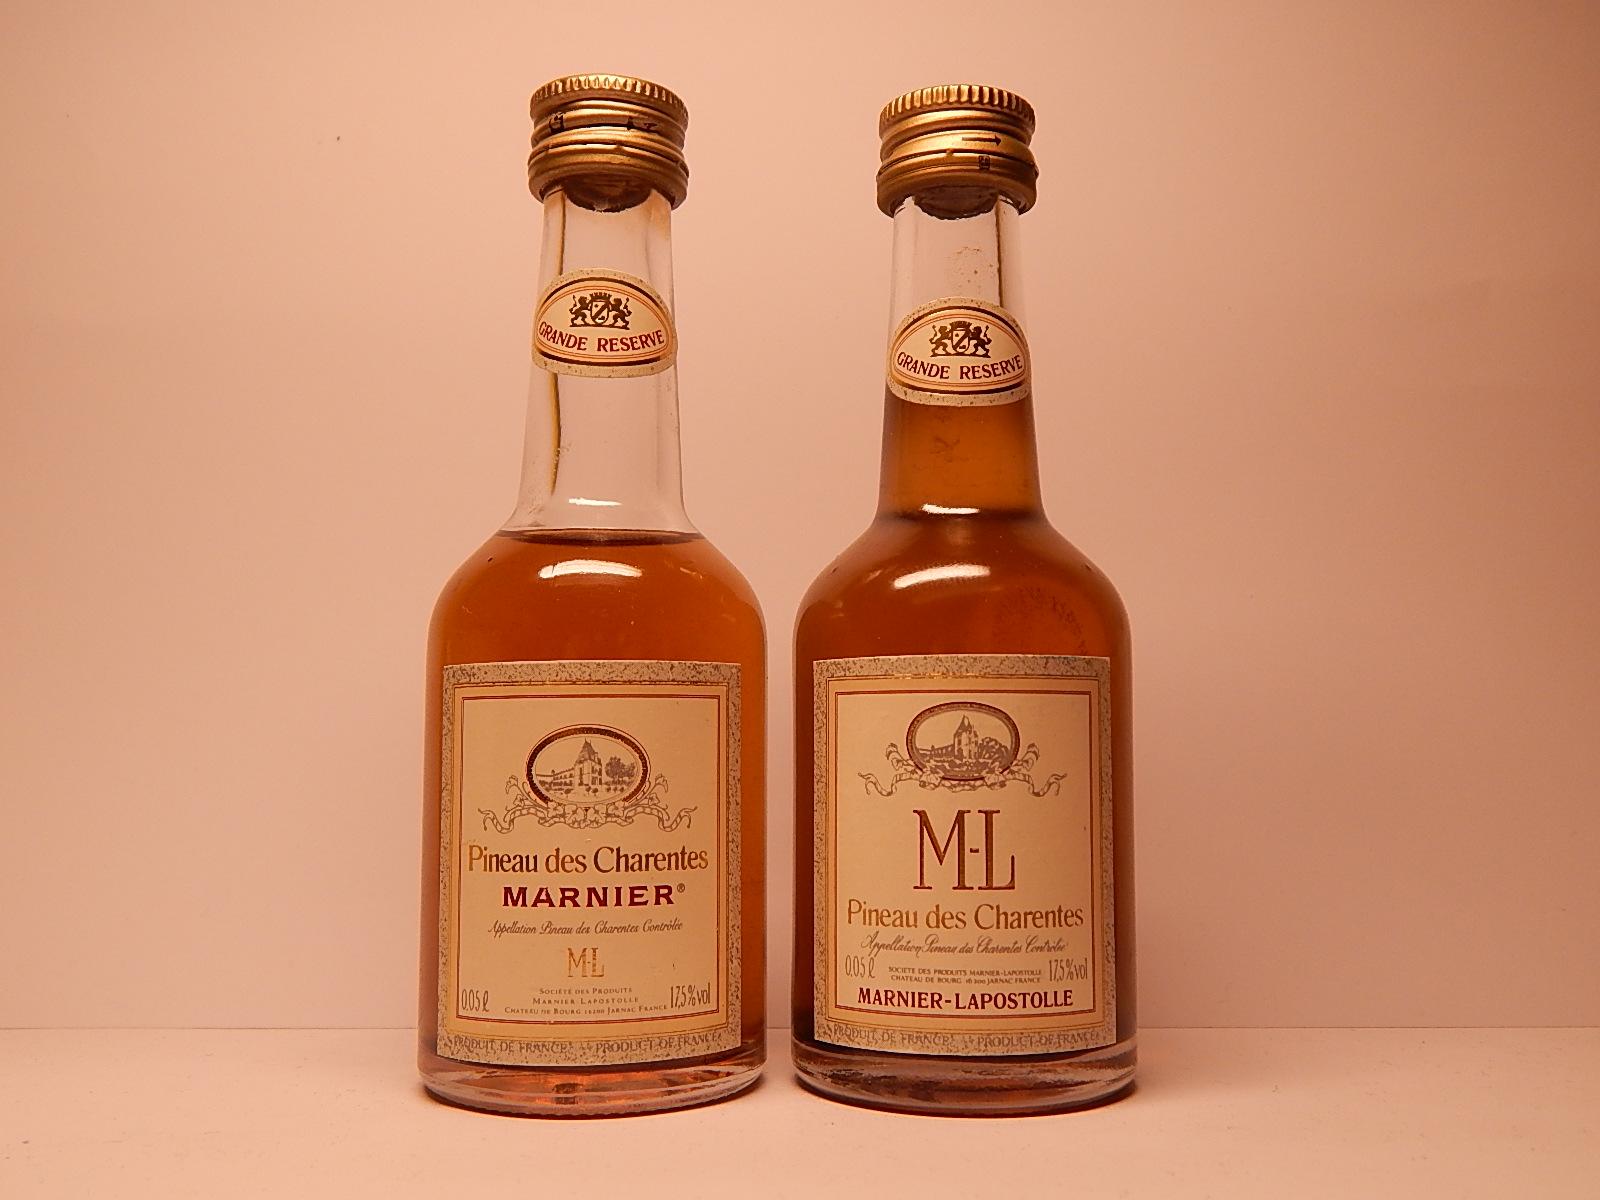 Grand Marnier Total Wine Cognac Liqueur Marnier